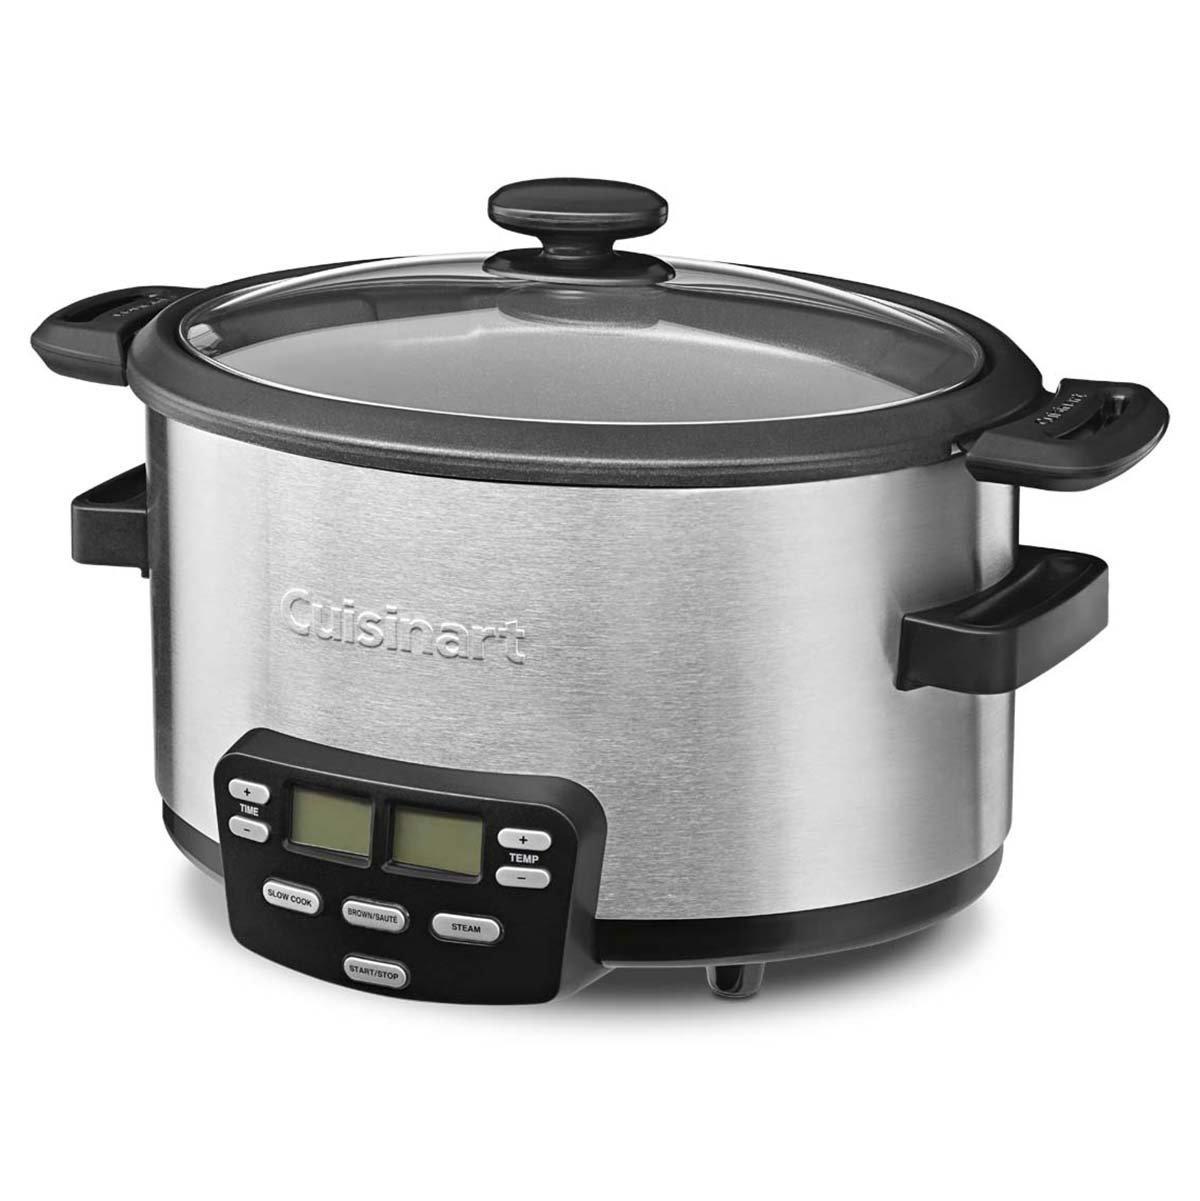 Cuisinart MSC-400FR 4 Quart Multifunction Cooker (Certified Refurbished)